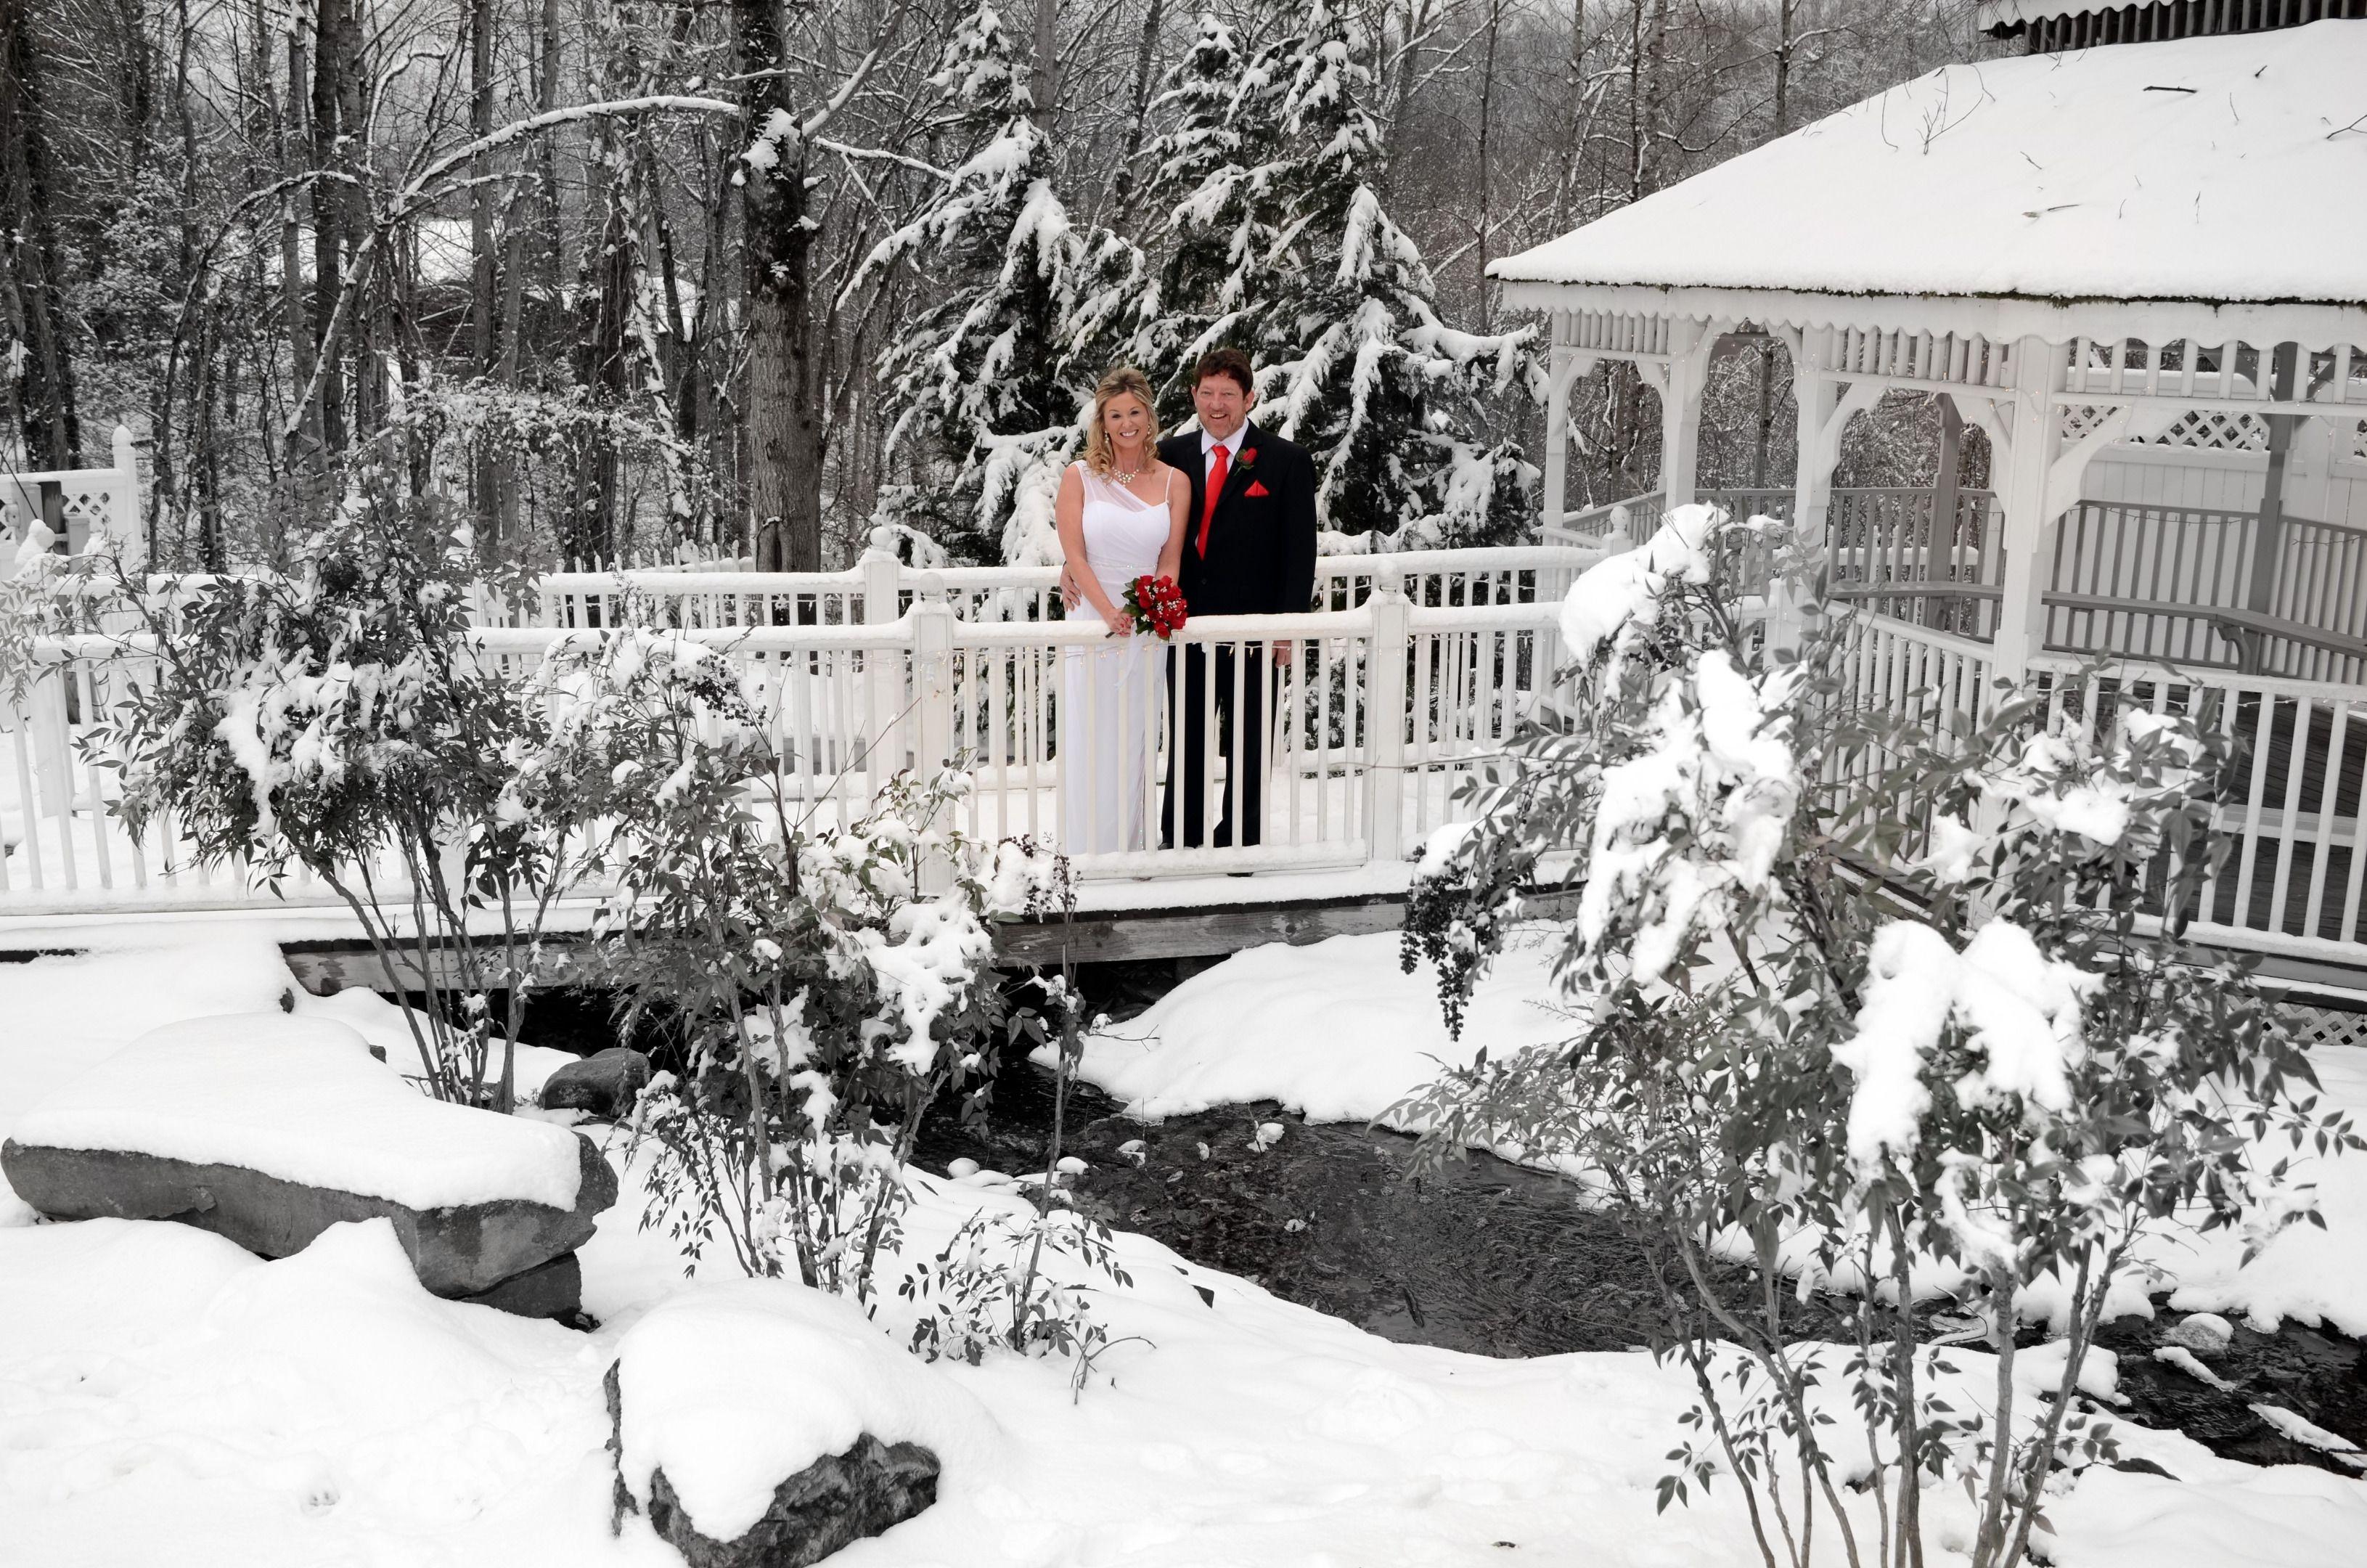 Wedding Chapel at Honeymoon Hills, Gatlinburg Wedding Chapel image 14